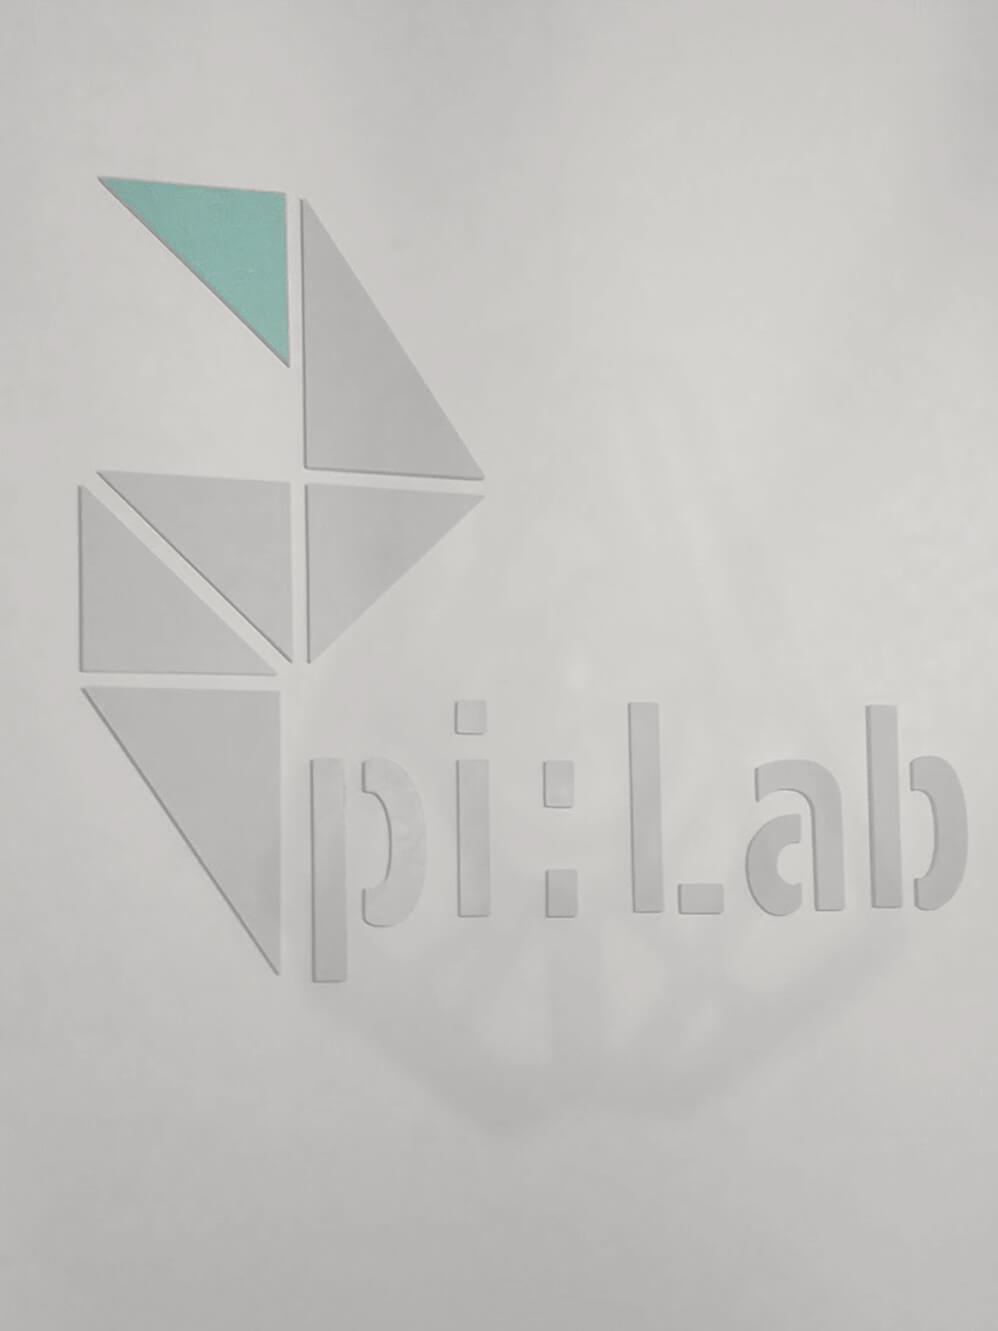 piLab